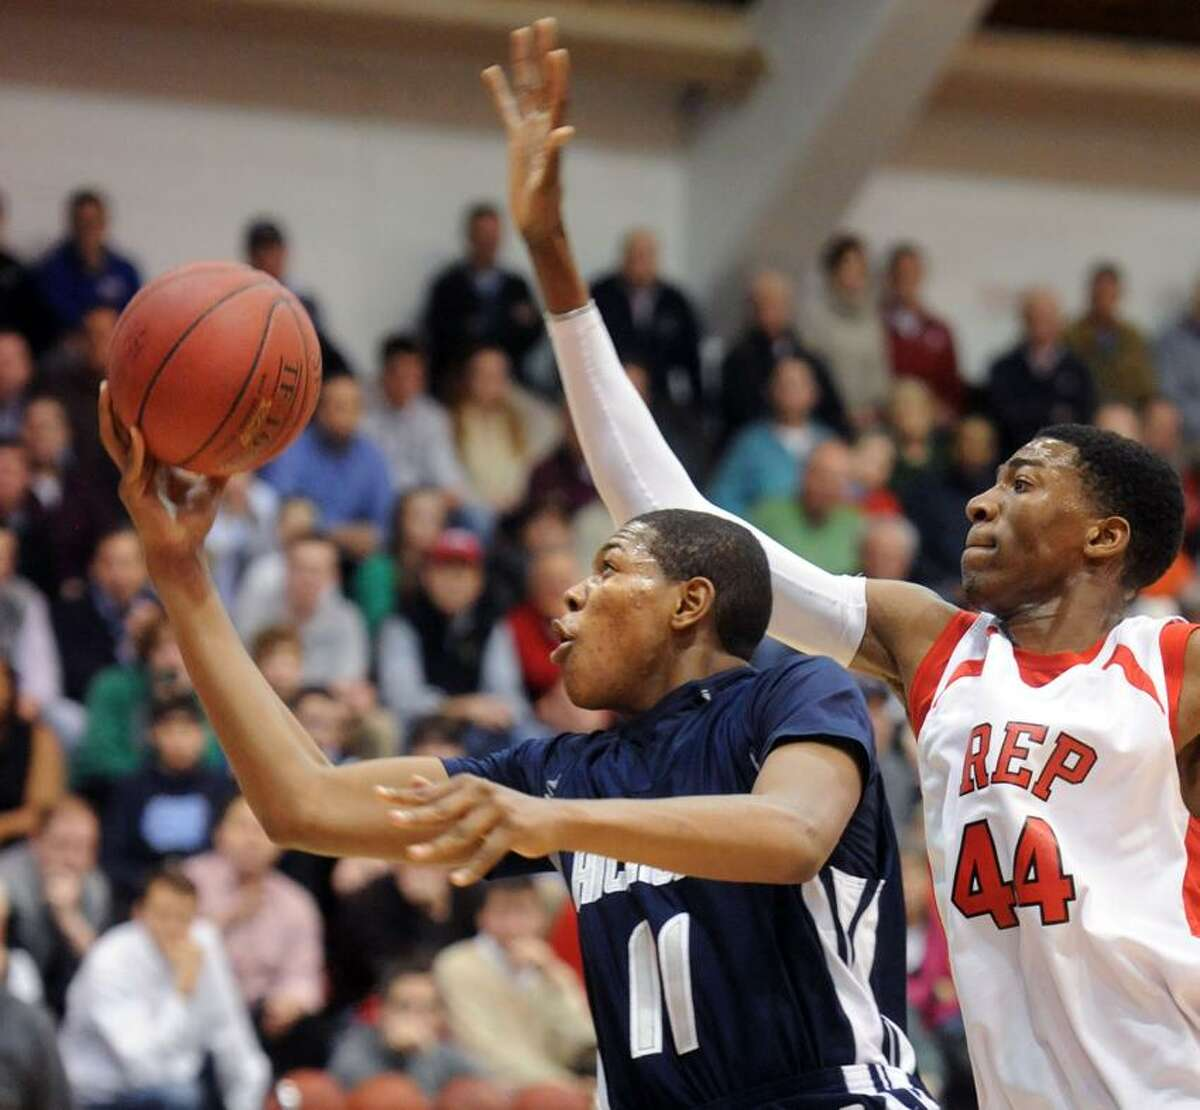 Hillhouse at Fairfield Prep, boys basketball. HH's Chaise Daniels, FP's Pascal Chukwu. Mara Lavitt/New Haven Register1/15/13